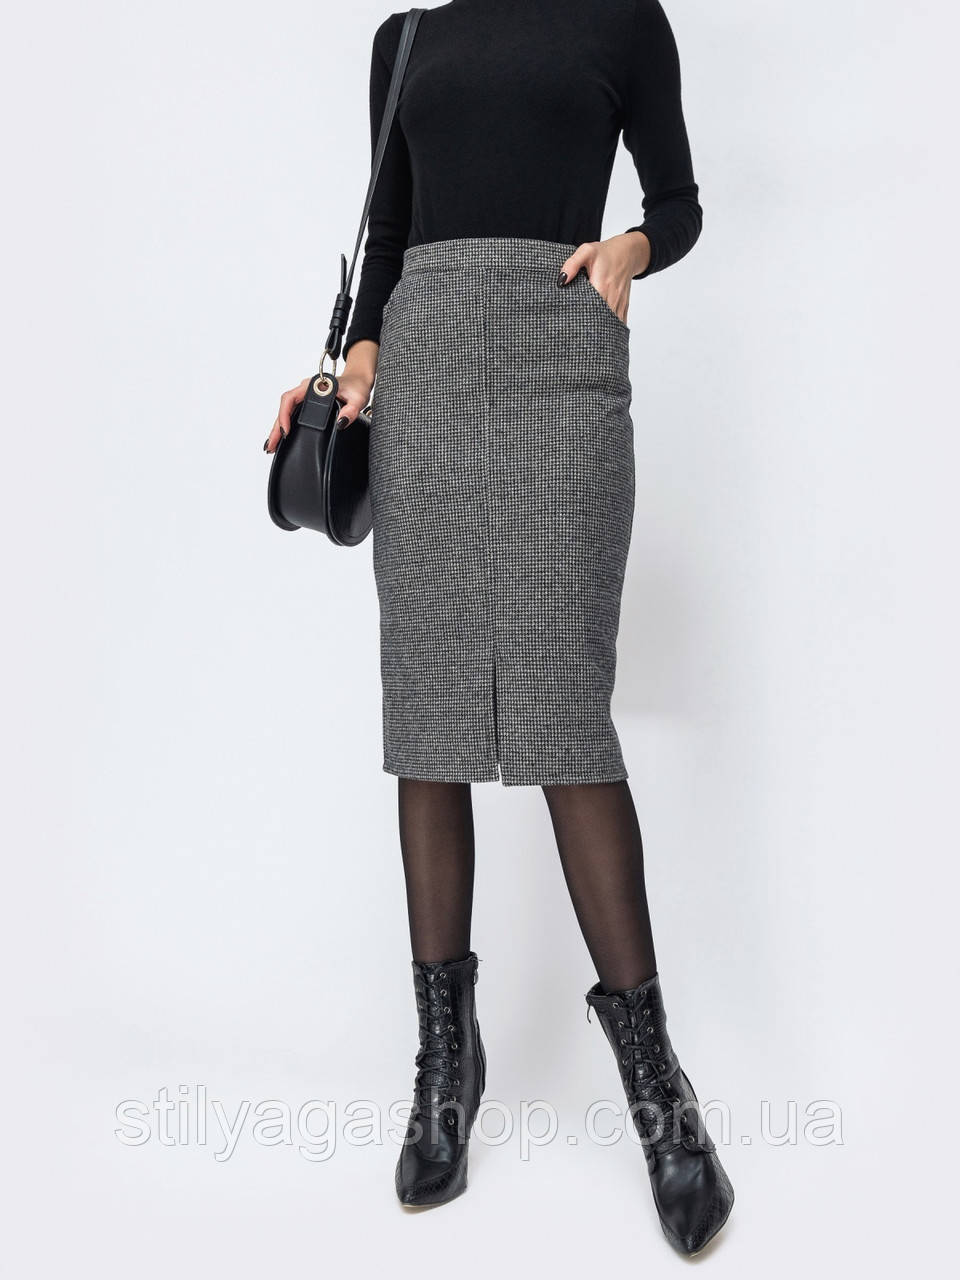 Лаконичная юбка-карандаш из твида